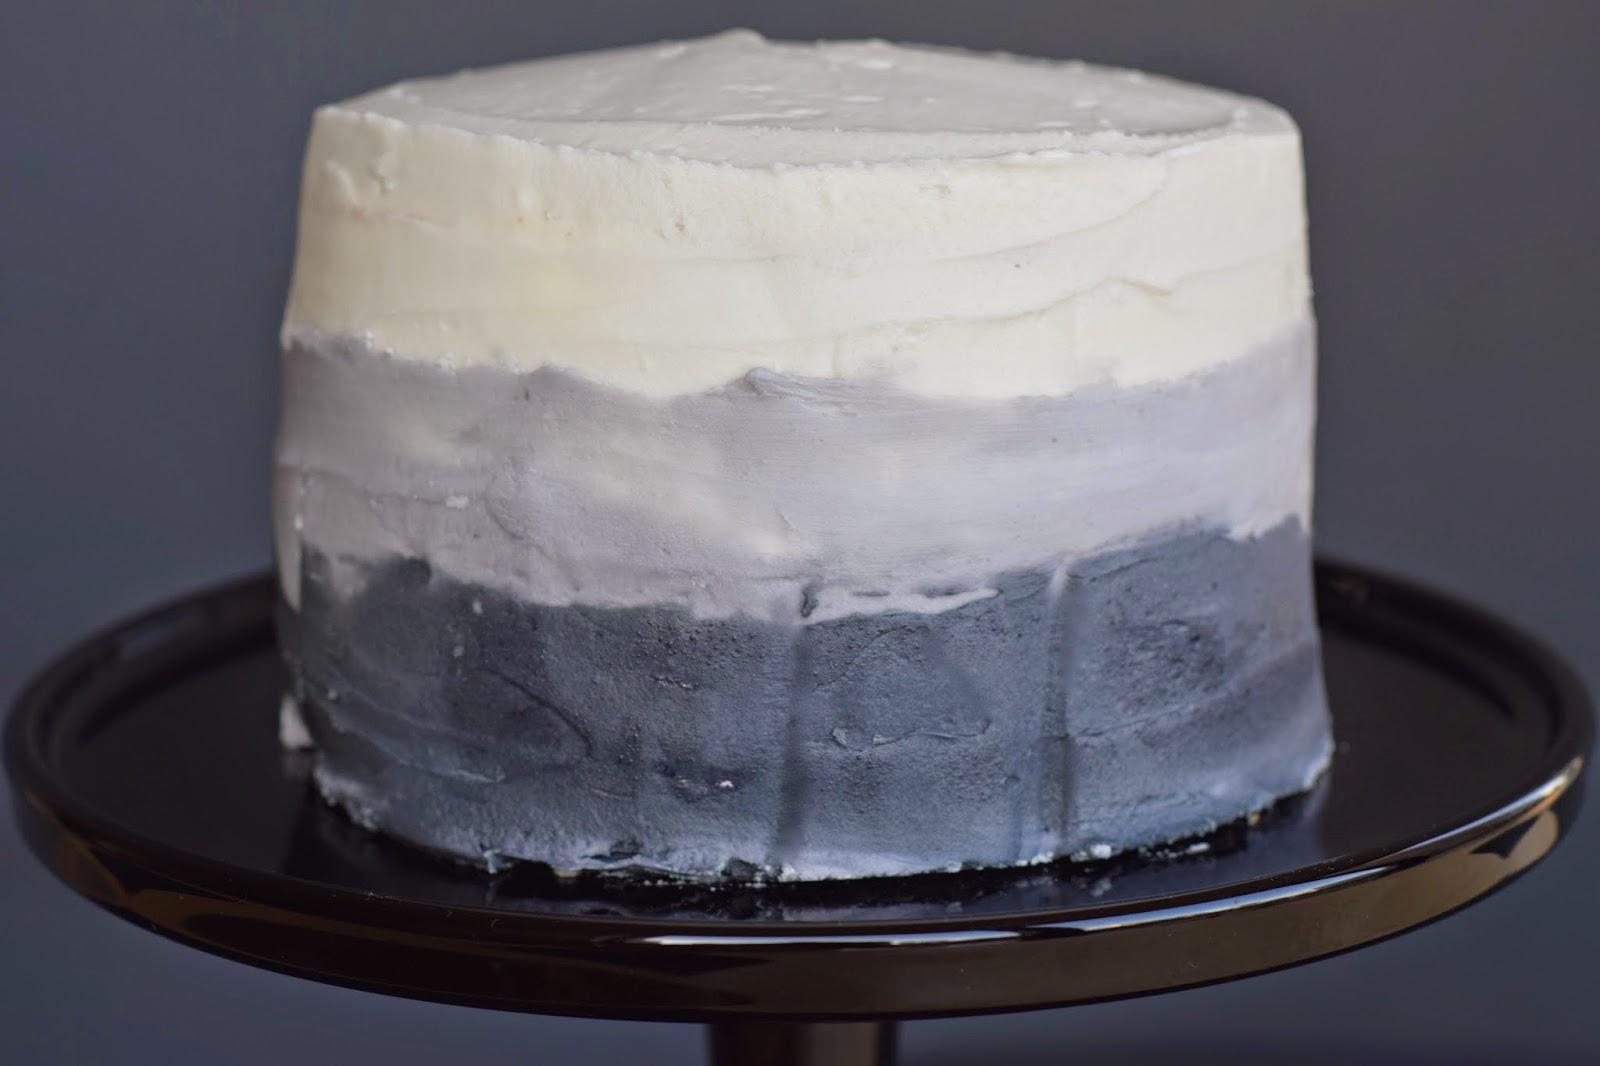 nasty gal cake